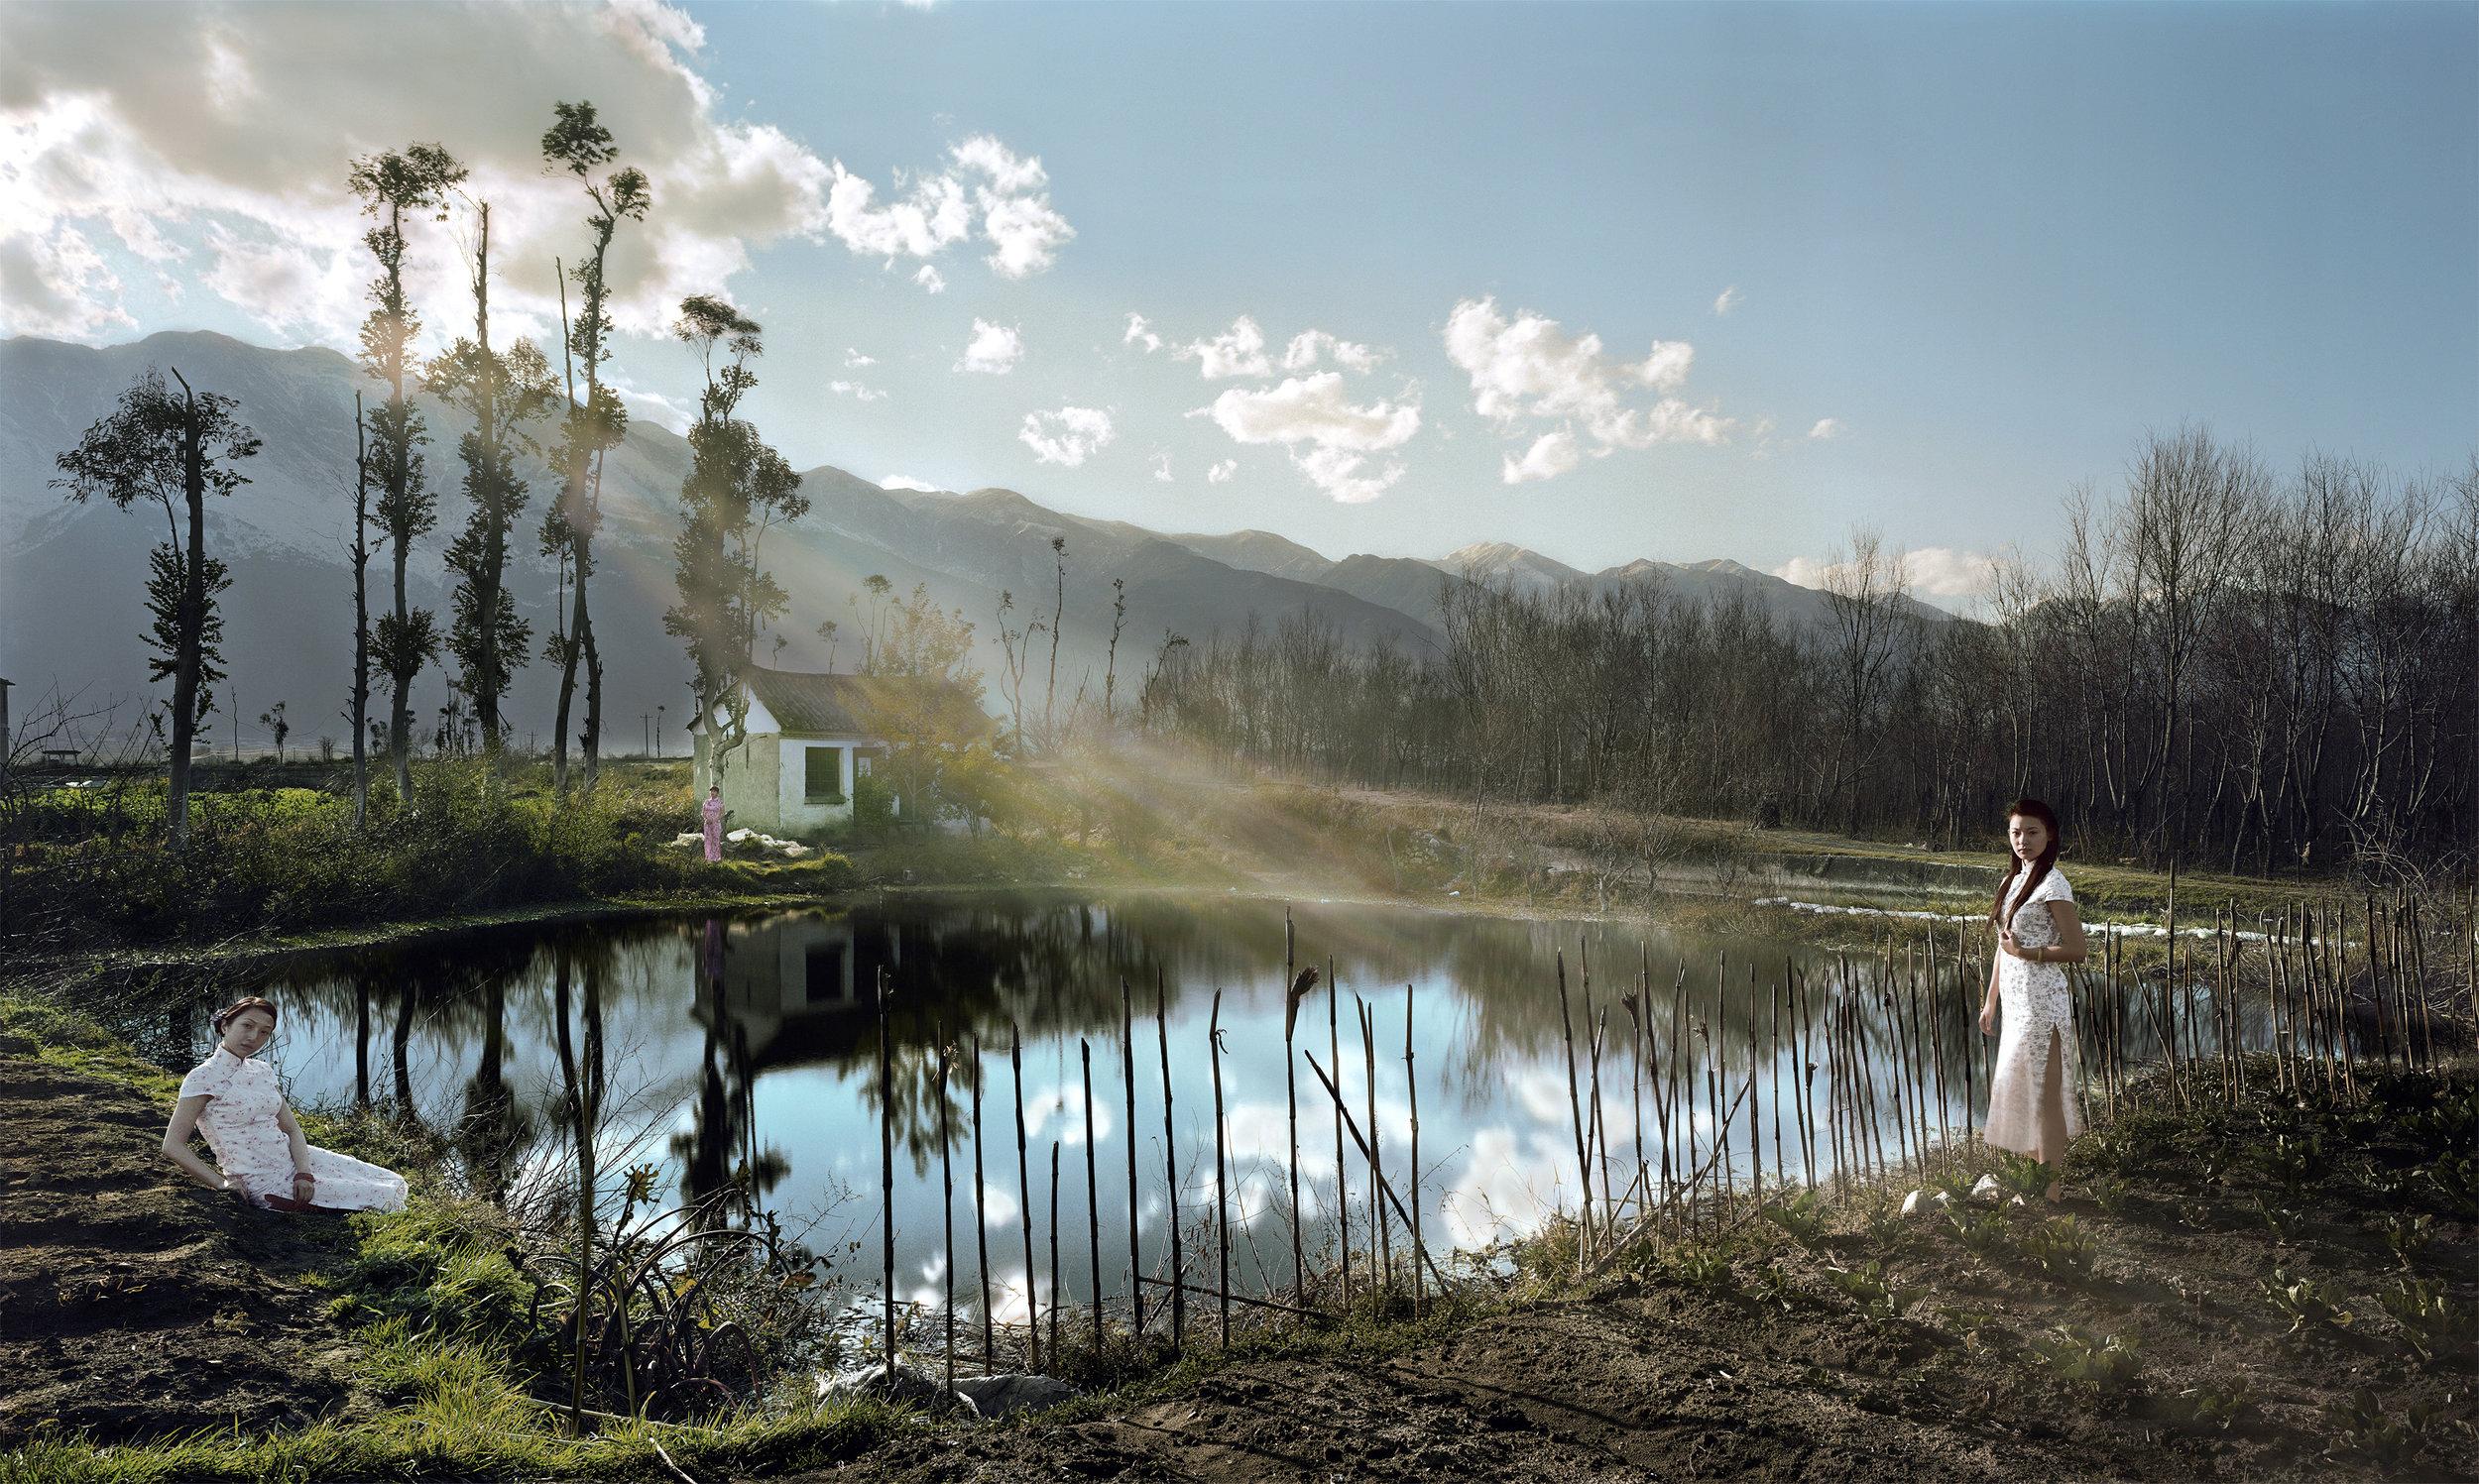 Pond (Temptation Series), 2008, 110 x 180 cm, Chromogenic photograph (Edition 4 of 12)